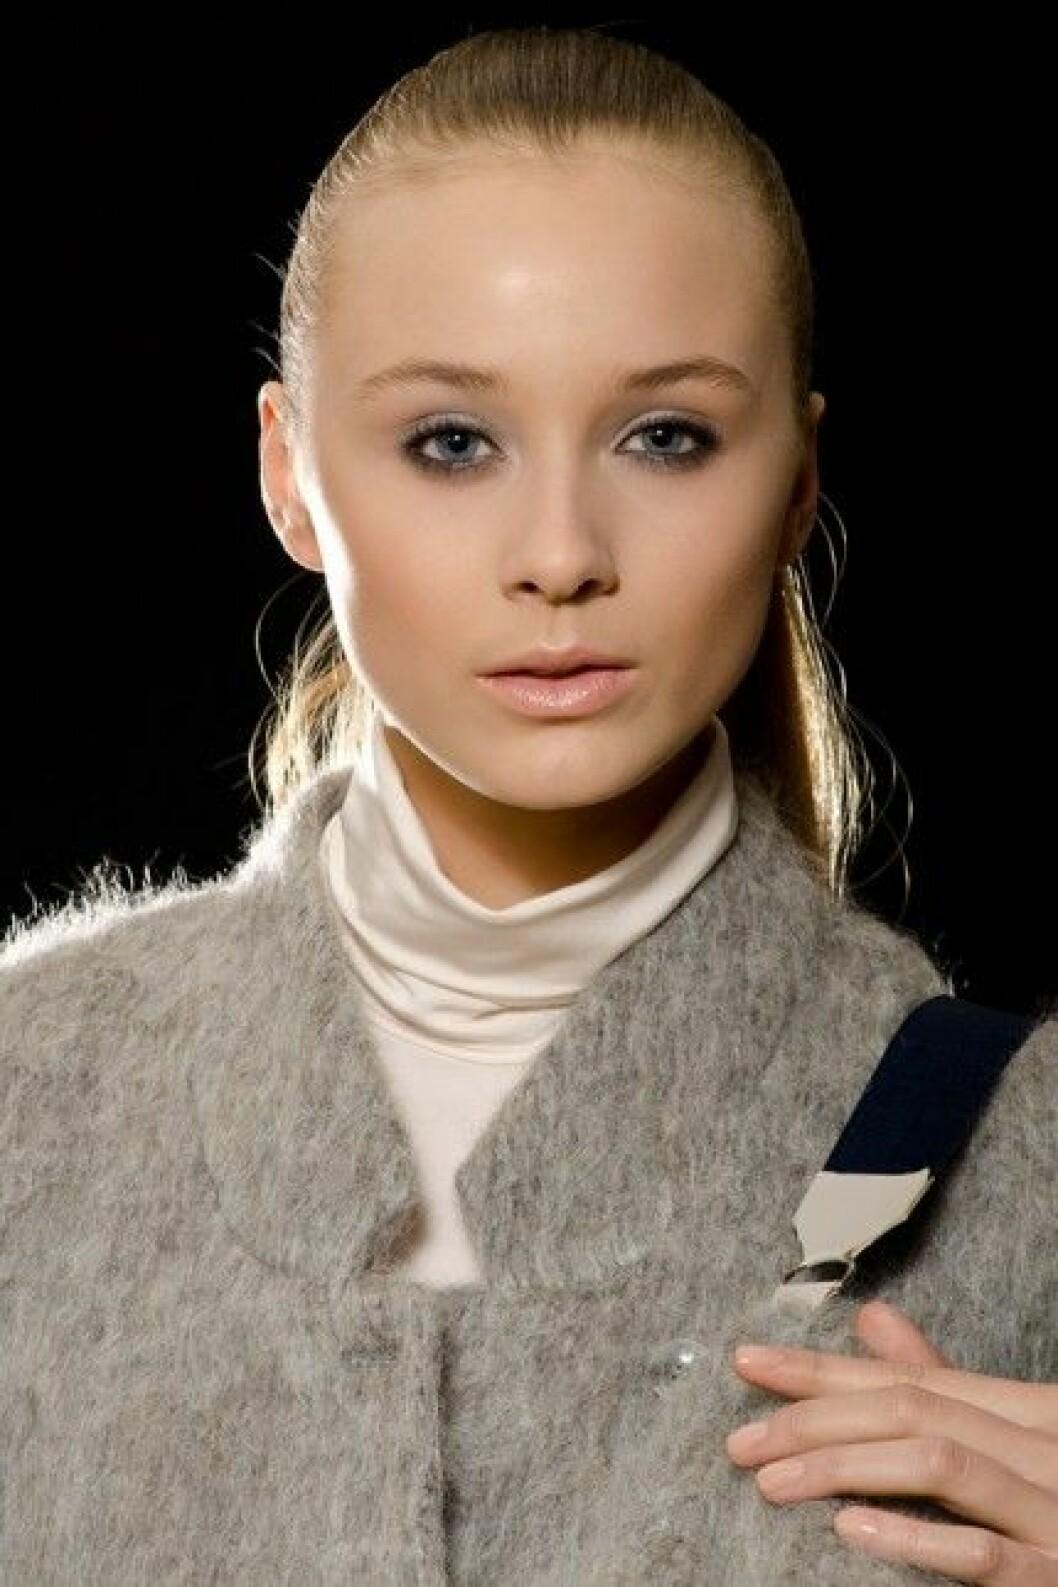 Carin Wester, A/W 2012. Modell: Matilda Bakke/Stockholmsgruppen